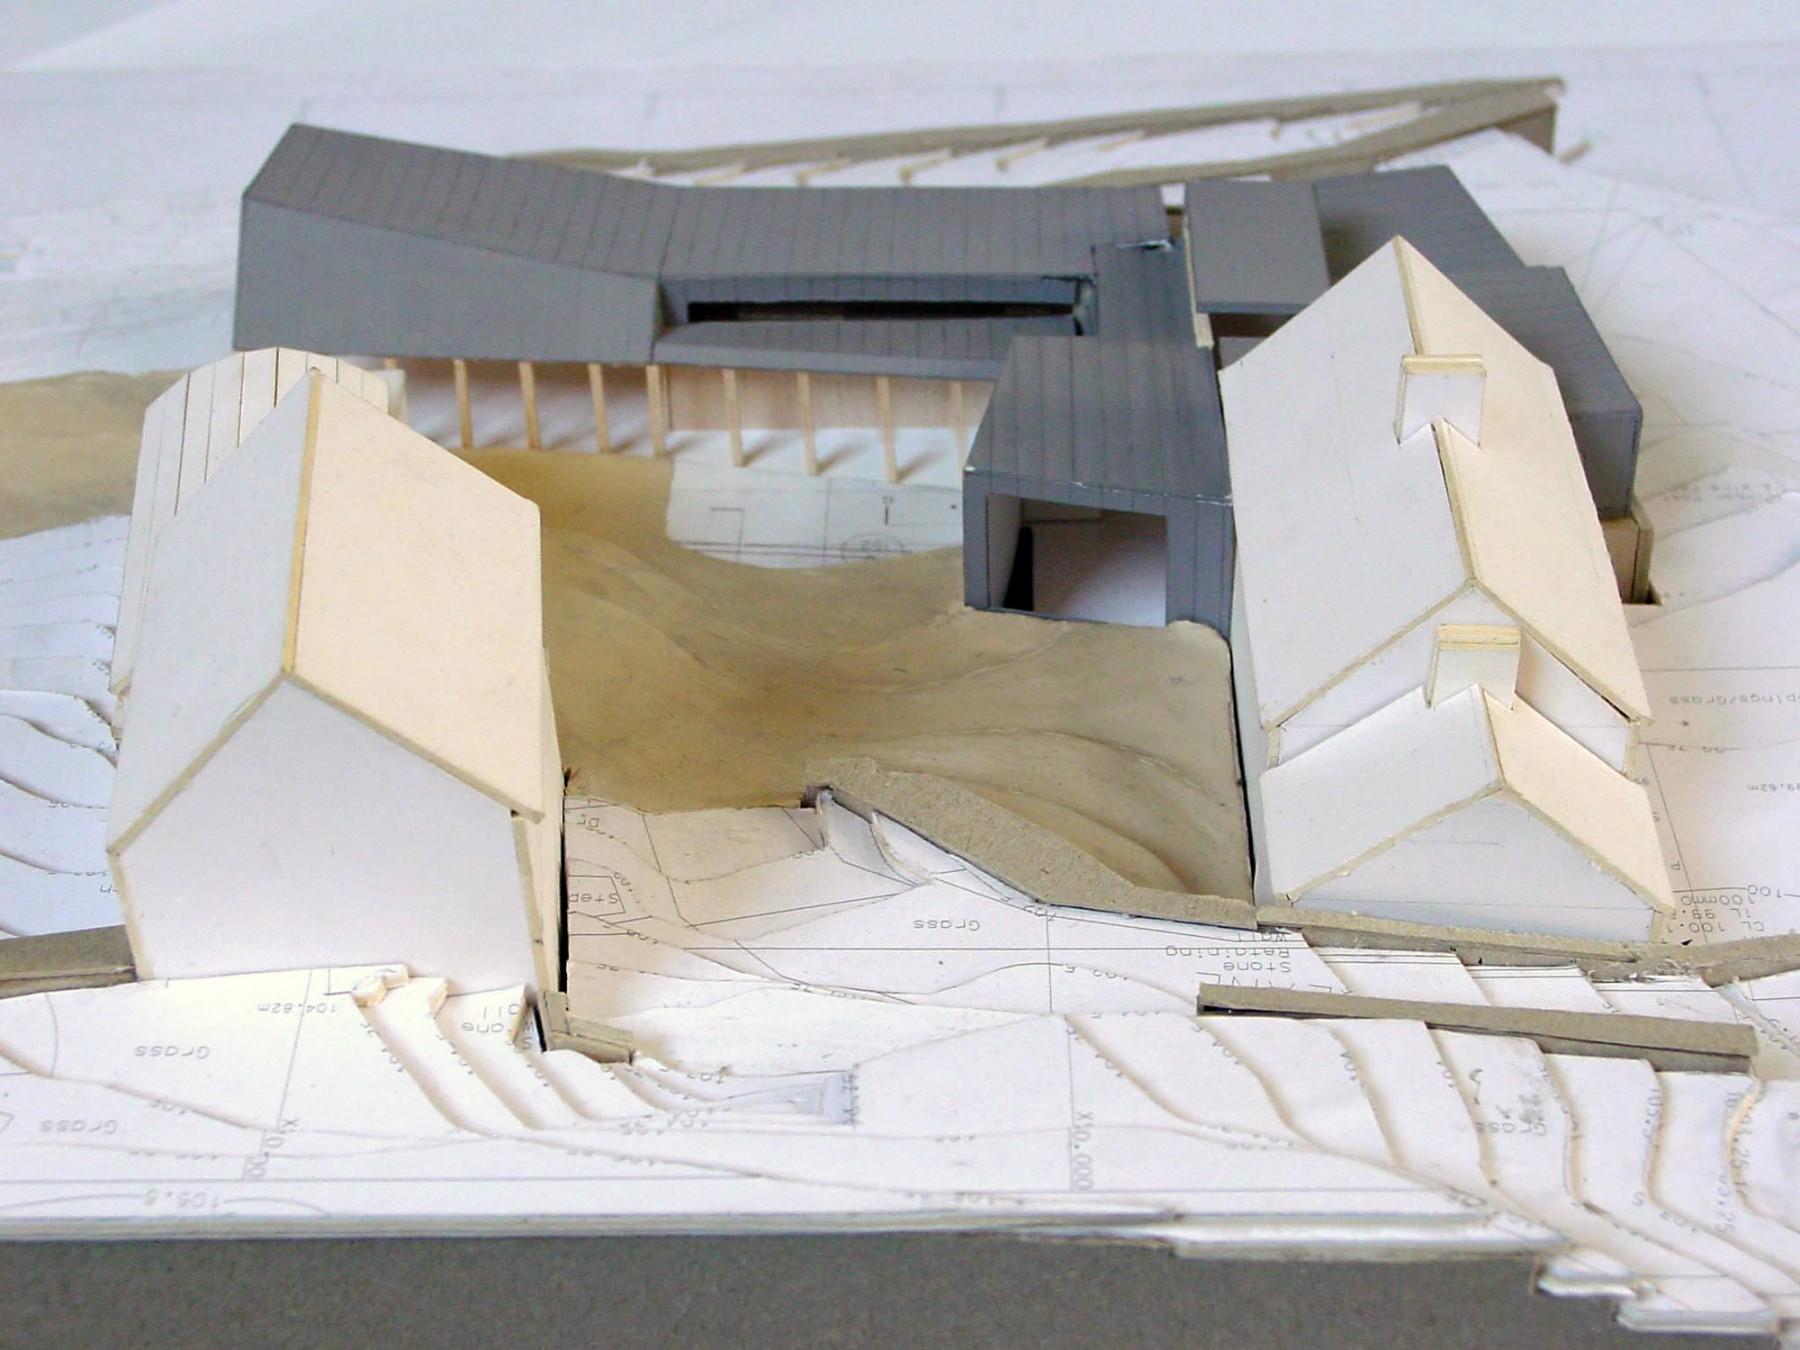 FaHa-Farm-house-barn-County-Clare-Ireland-residential-home-rural-timber-zinc-Jamie-Fobert-Architects-model